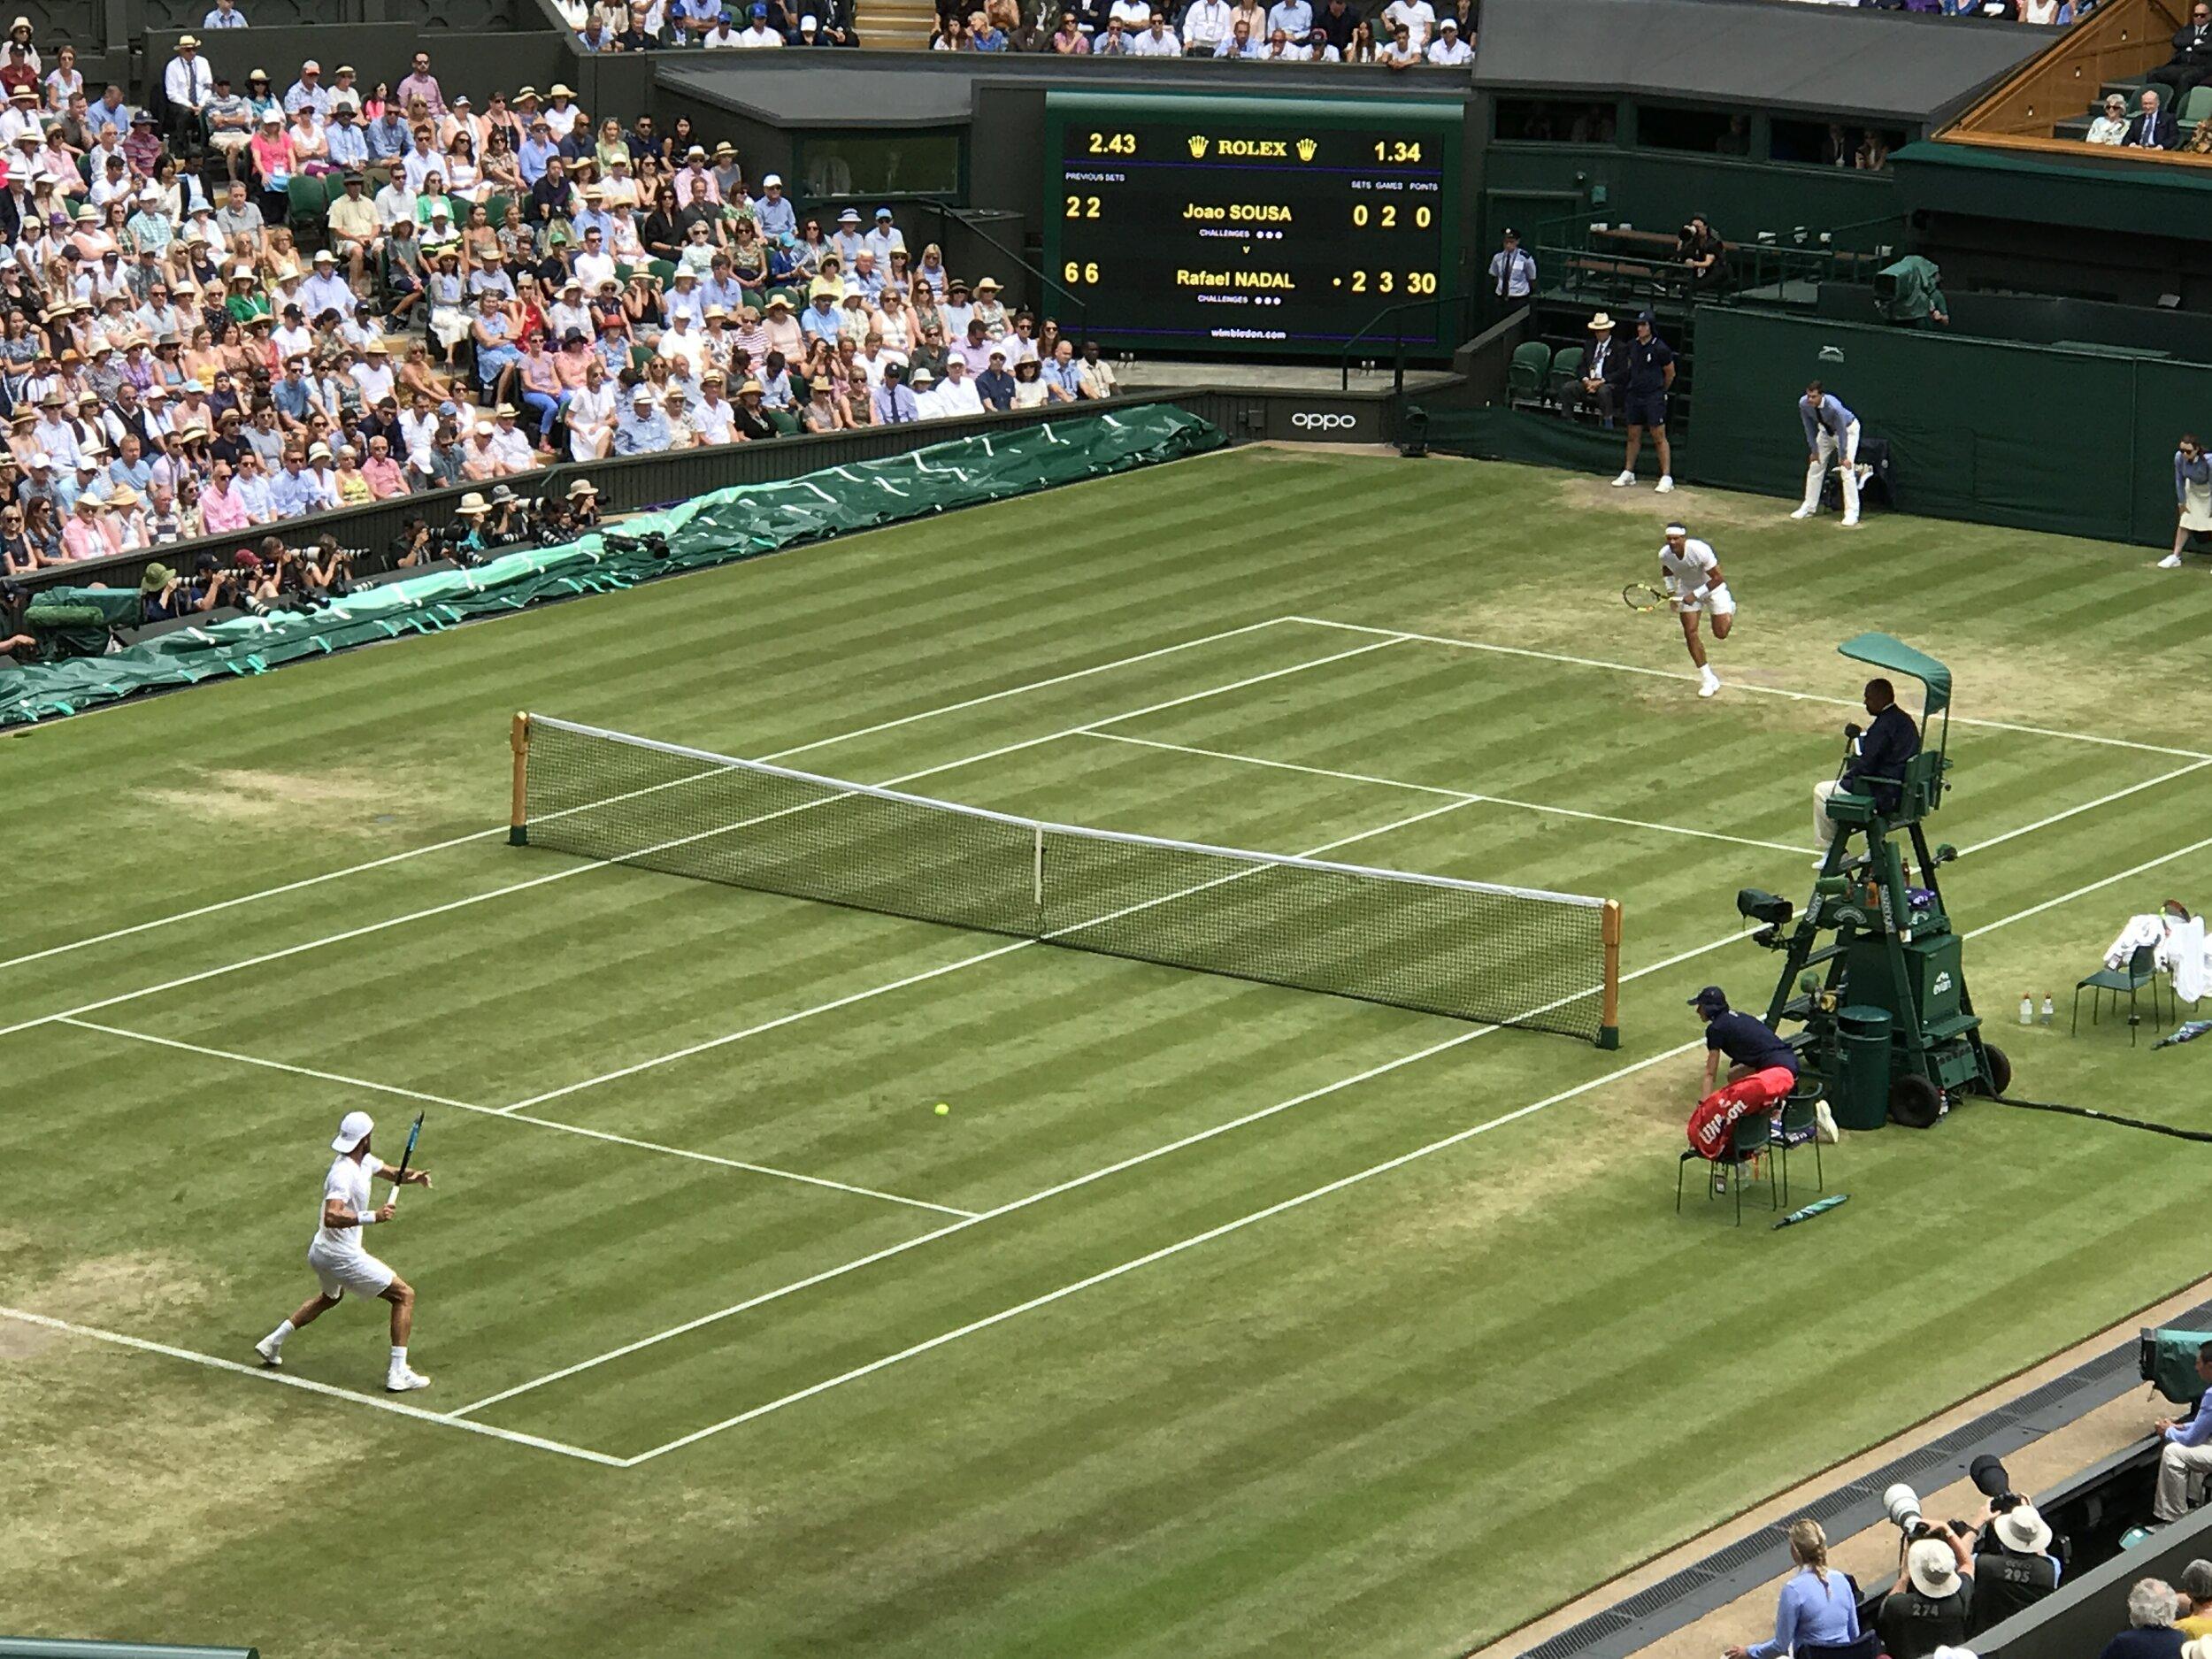 Wimbledon_2019_Nadal_v_Sousa.jpg